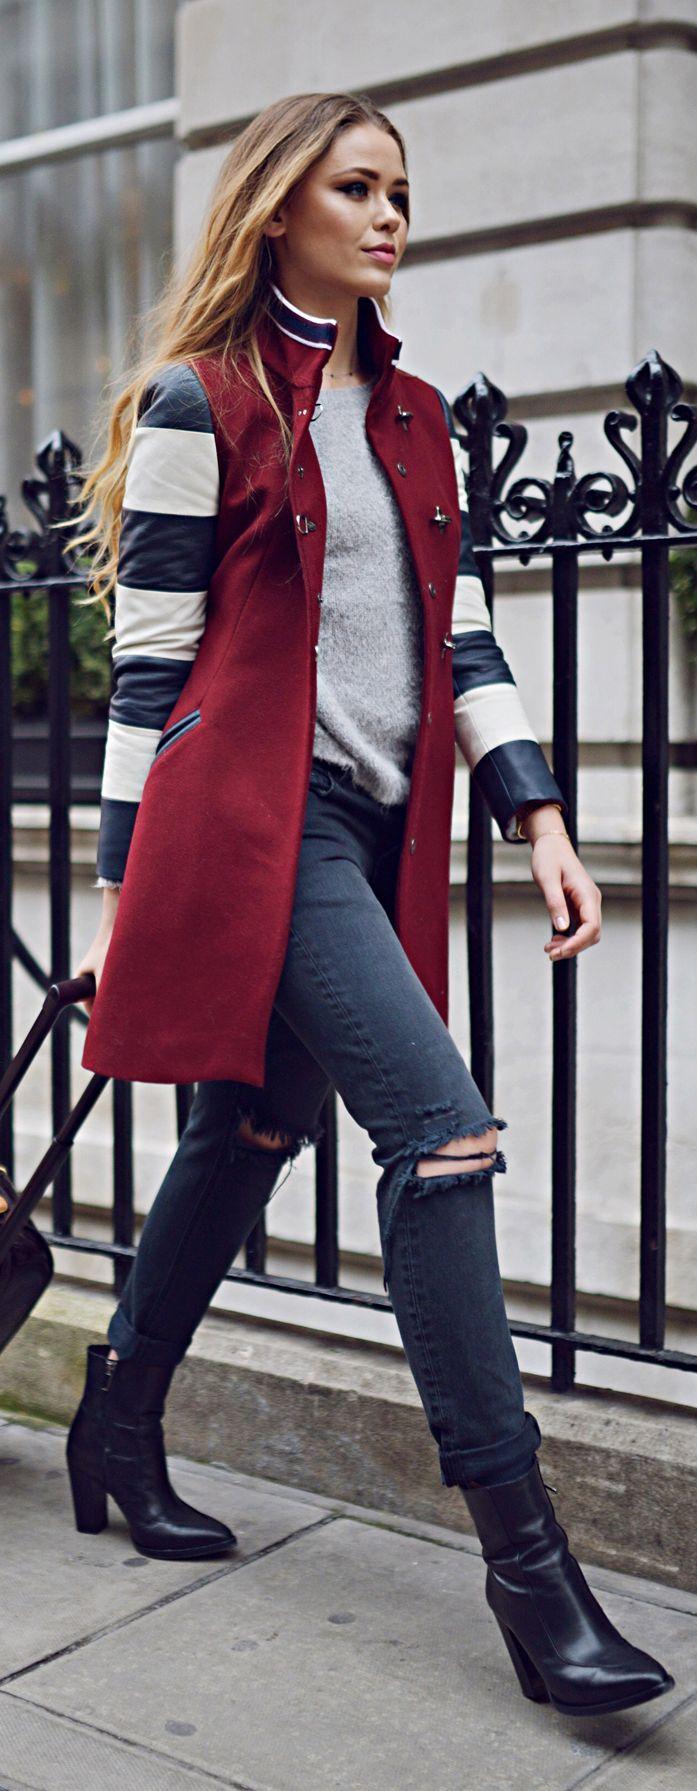 Multi Black And White Contrast Stripe Sleeve Coat.